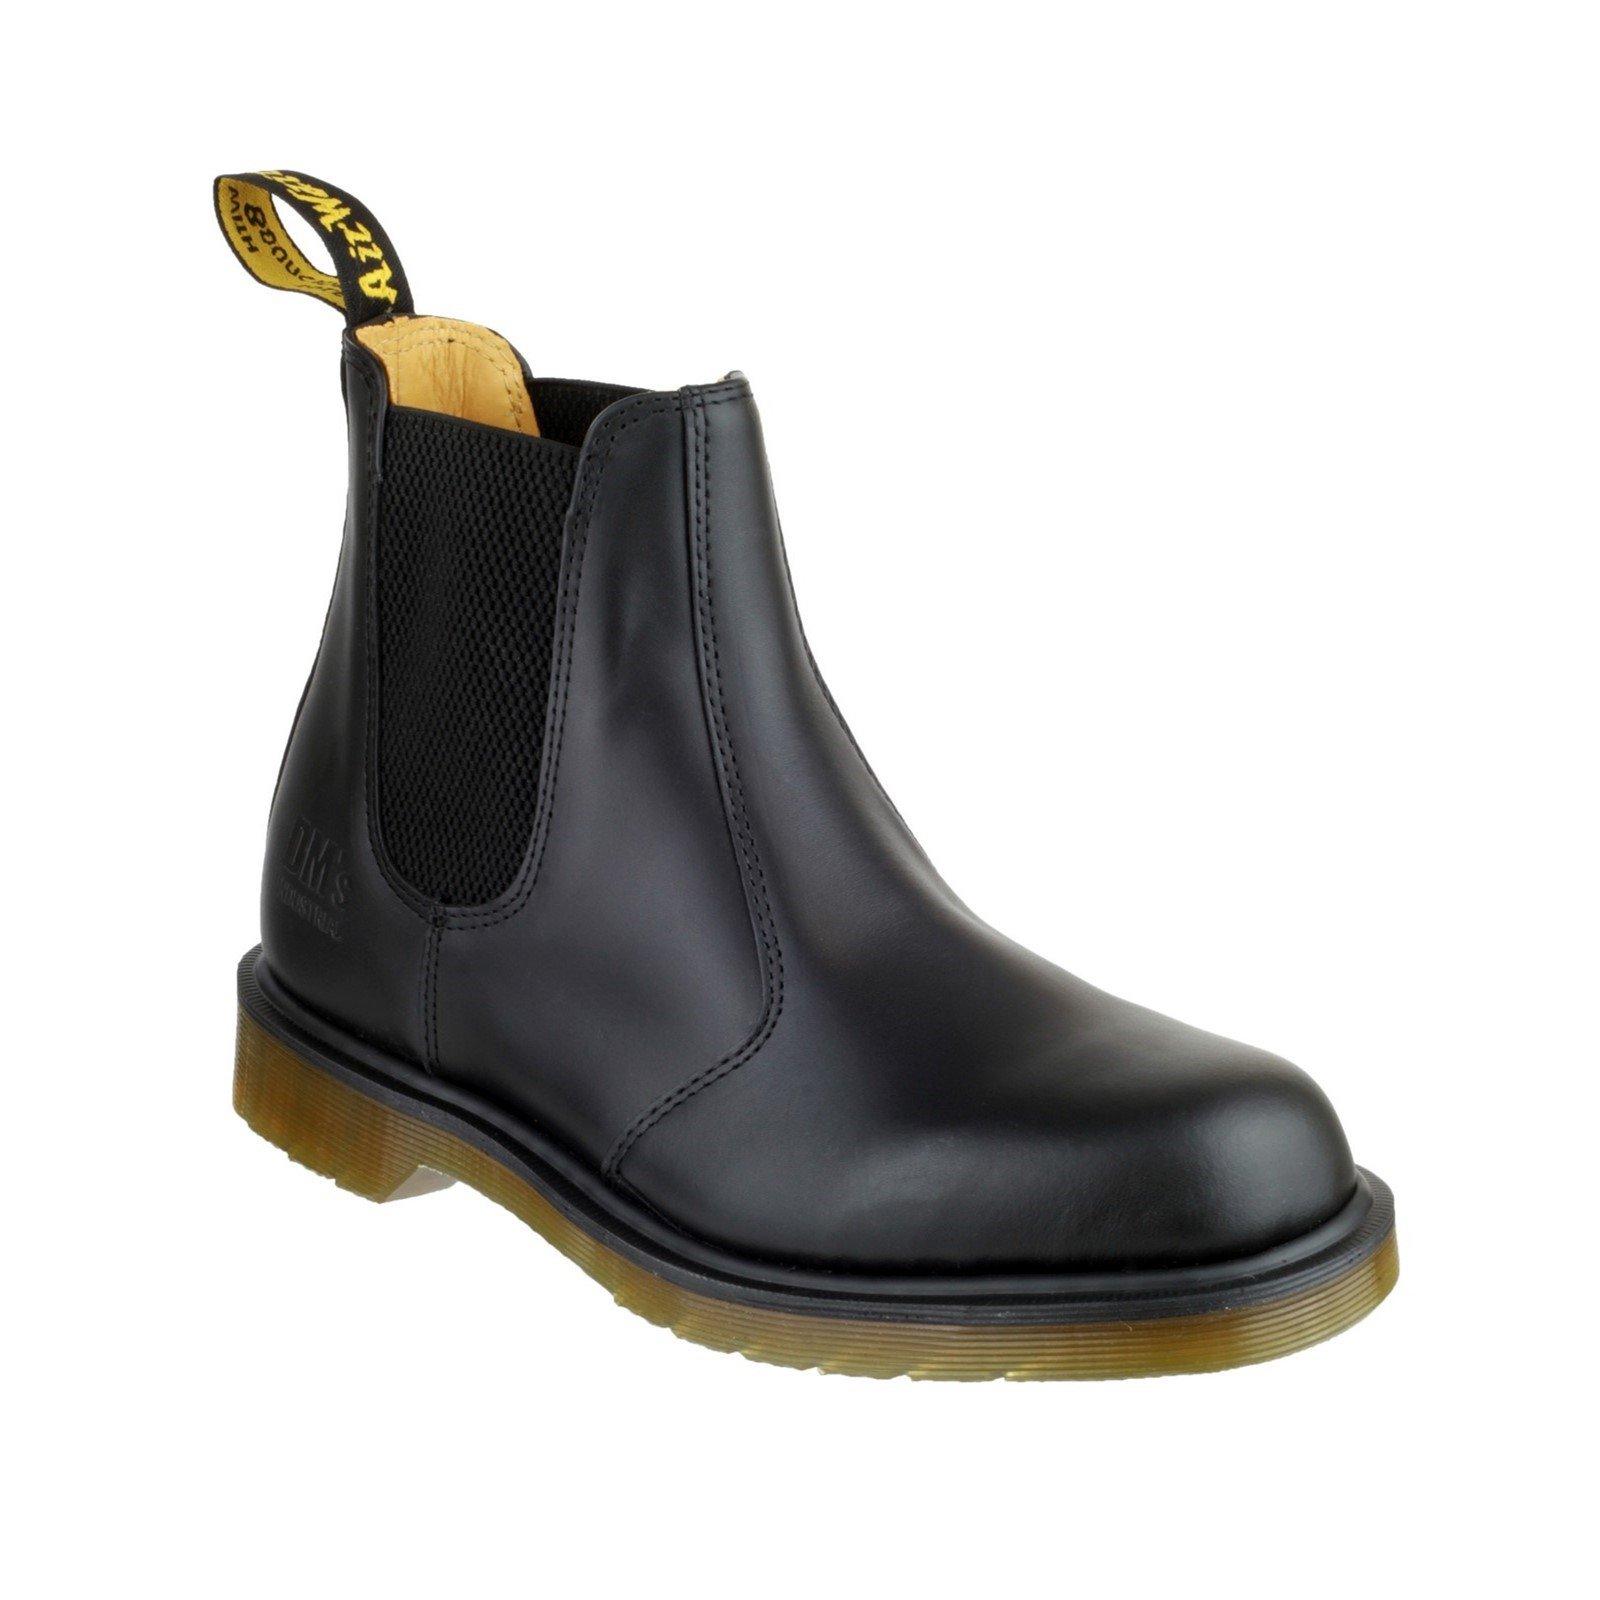 Dr Martens Men's Slip-On Dealer Boot Black 04916 - Black 7